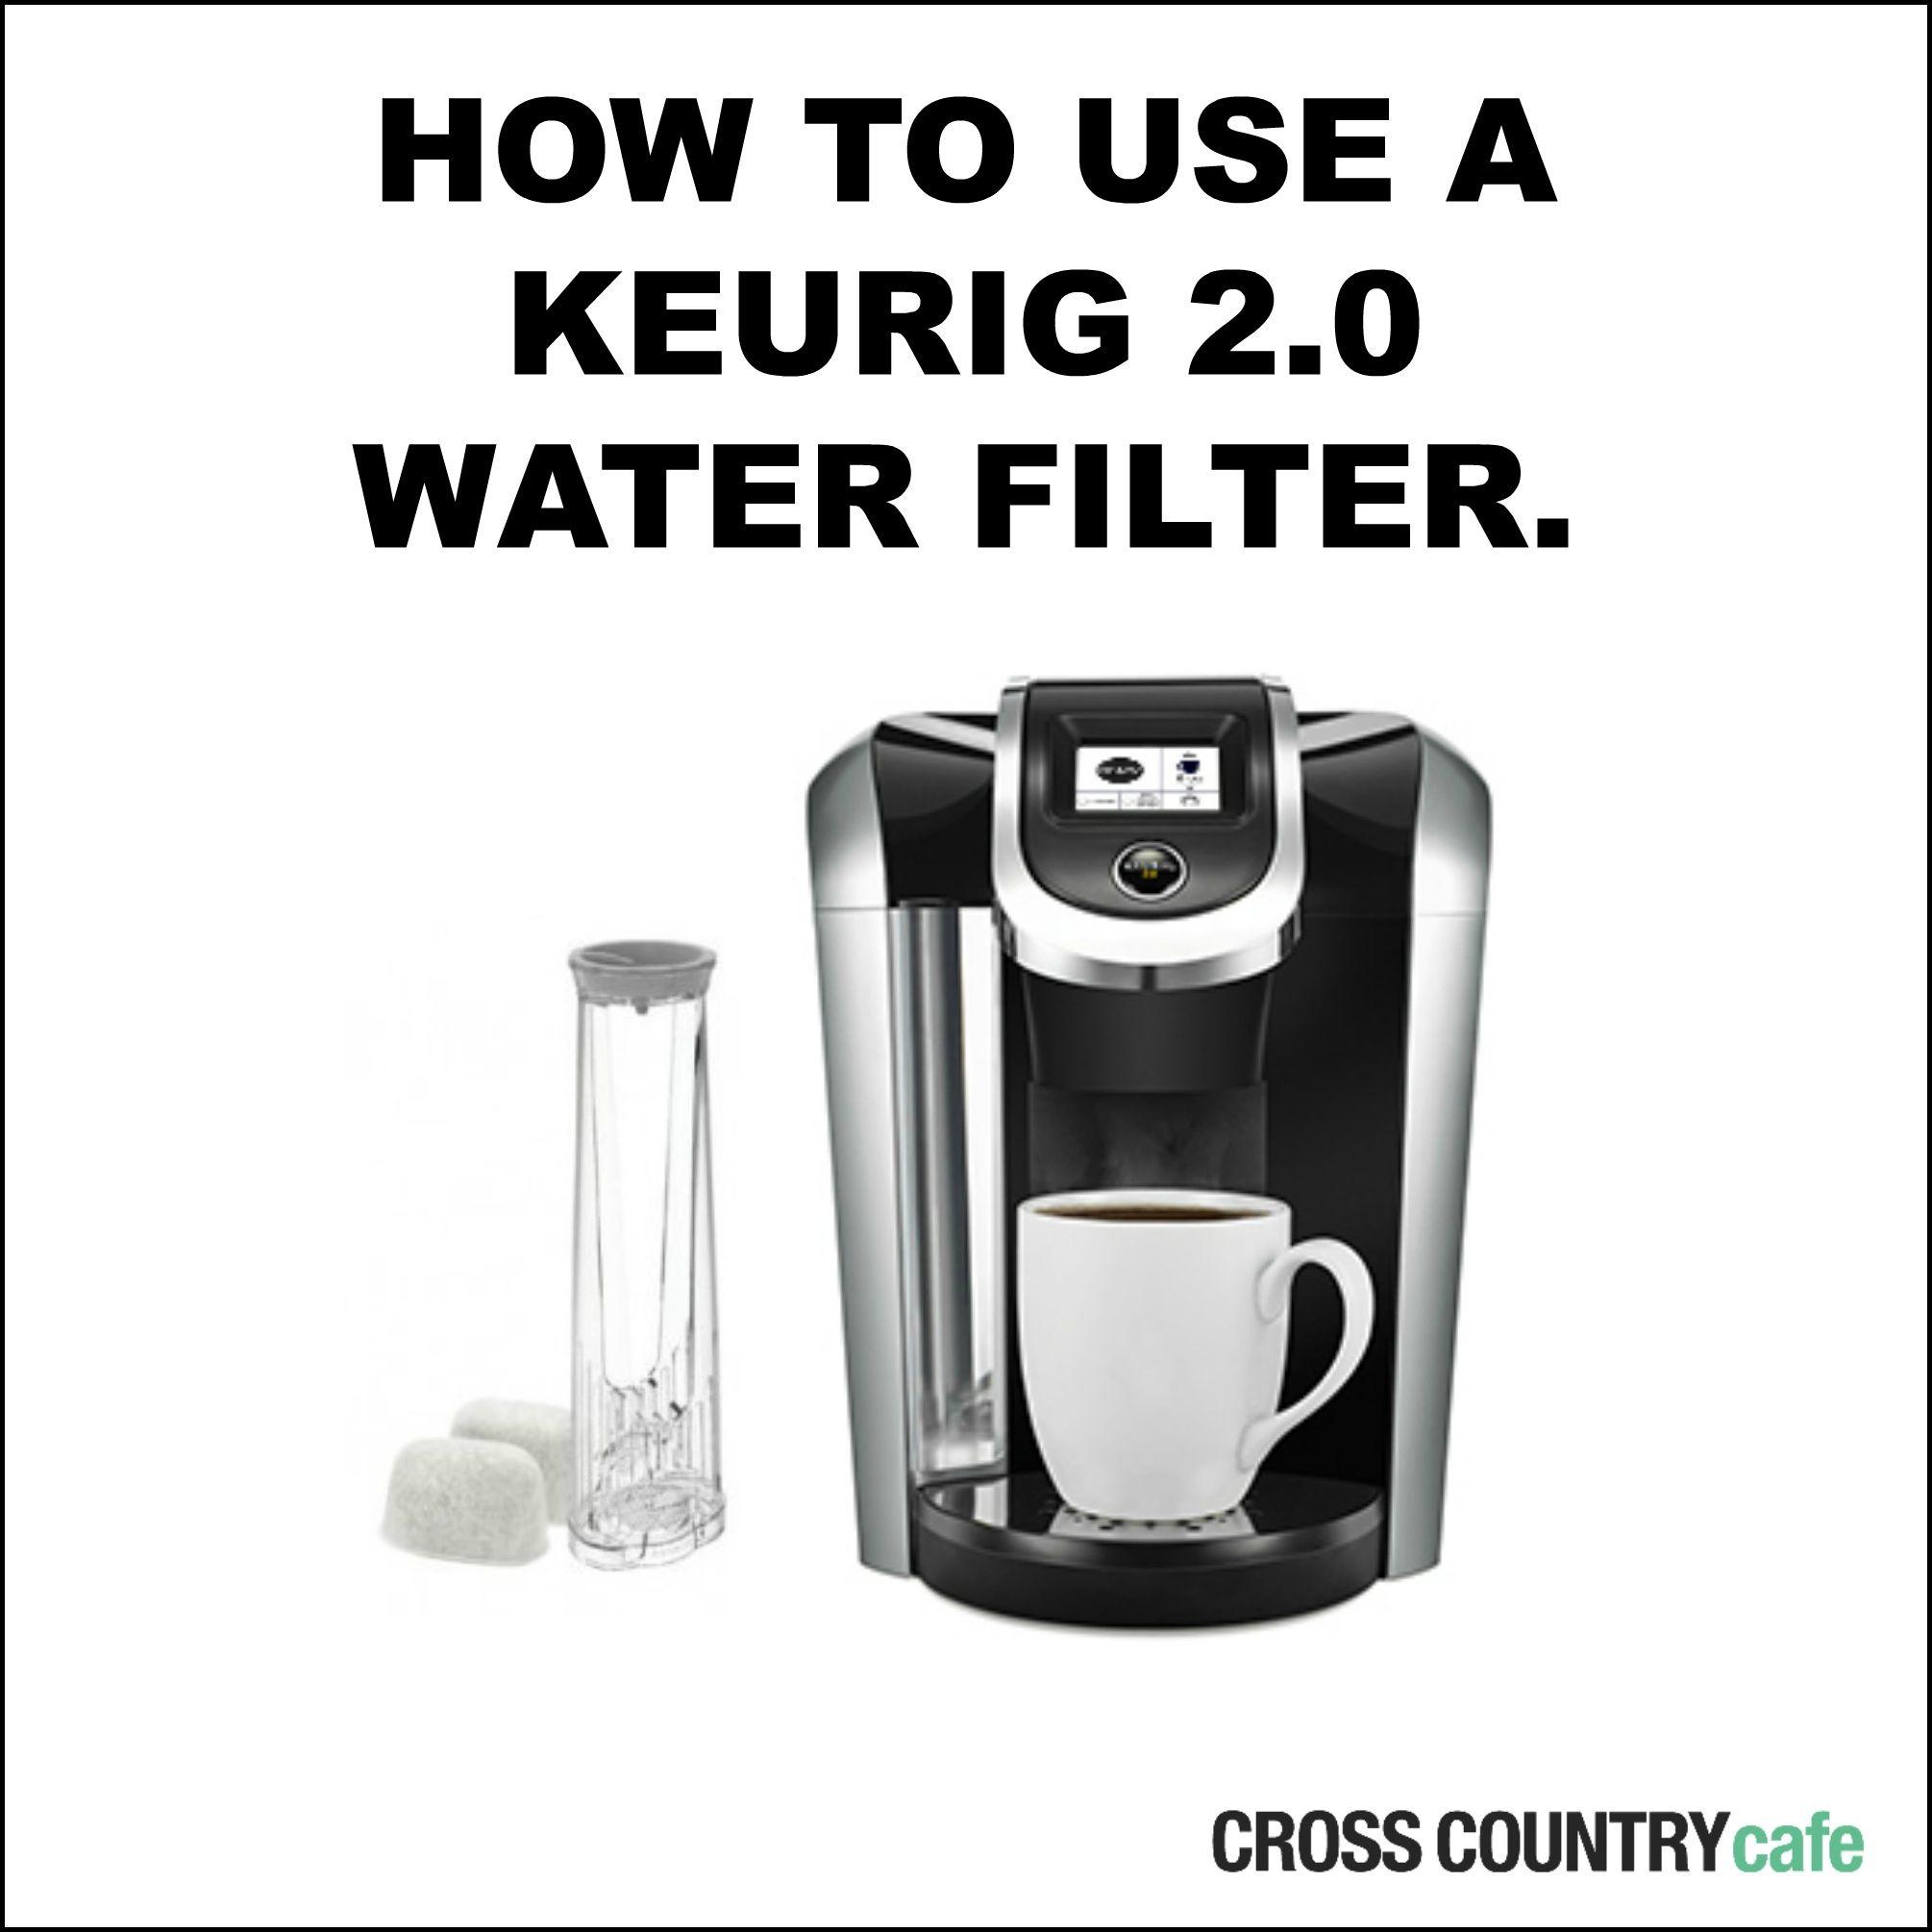 Keurig 2 0 Filter Replacement Instructions   Home   Keurig, Water